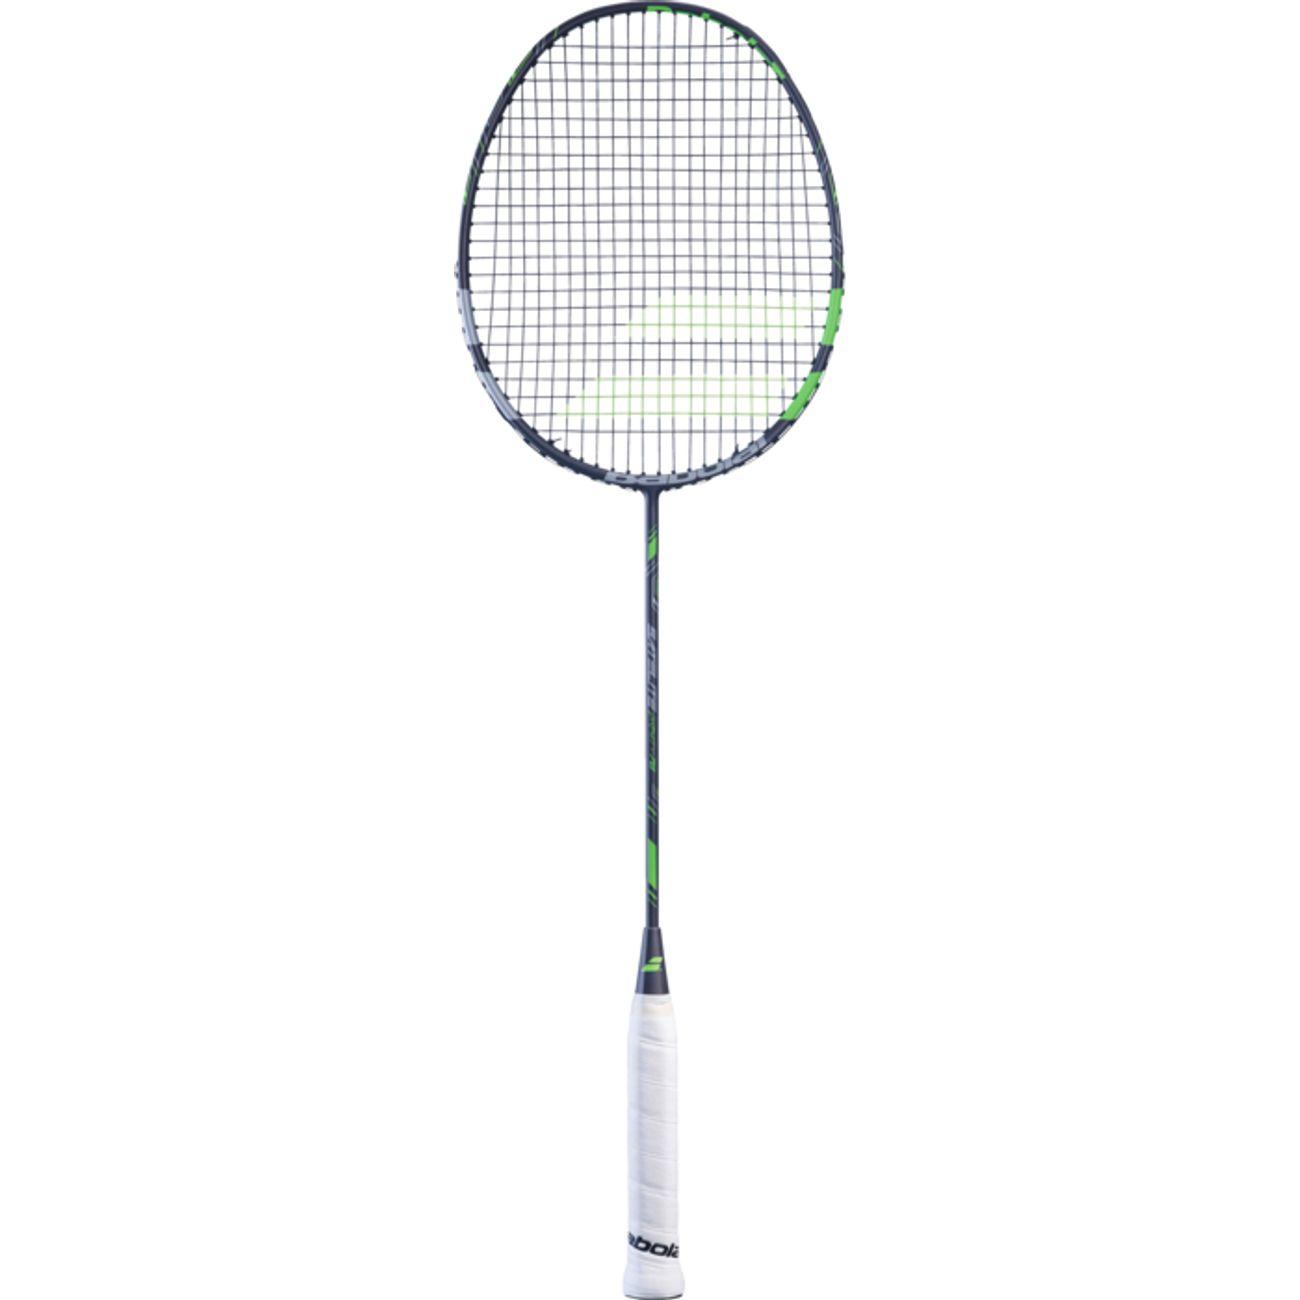 RAQUETTE Badminton adulte BABOLAT SATELITE GRAVITY 78